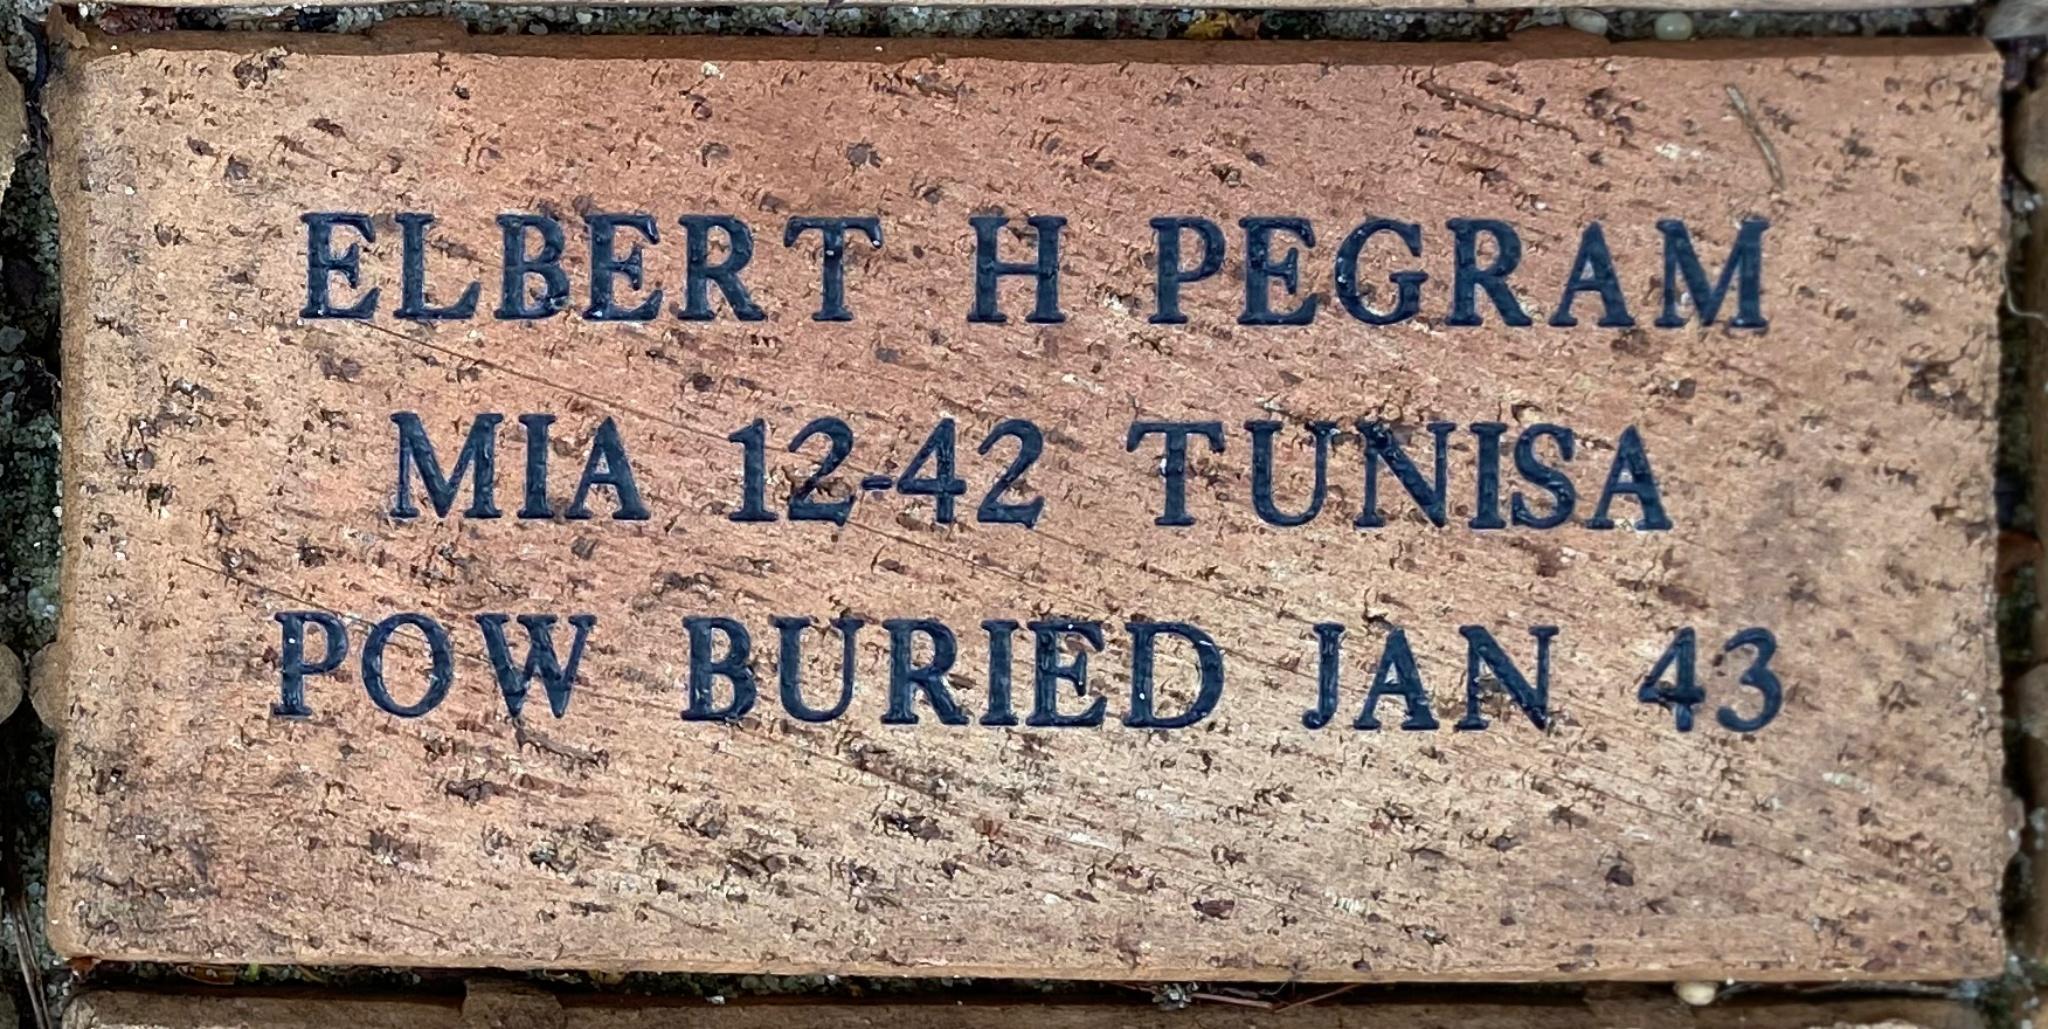 ELBERT H PEGRAM MIA 12-42 TUNSIA POW BURIED JAN 43